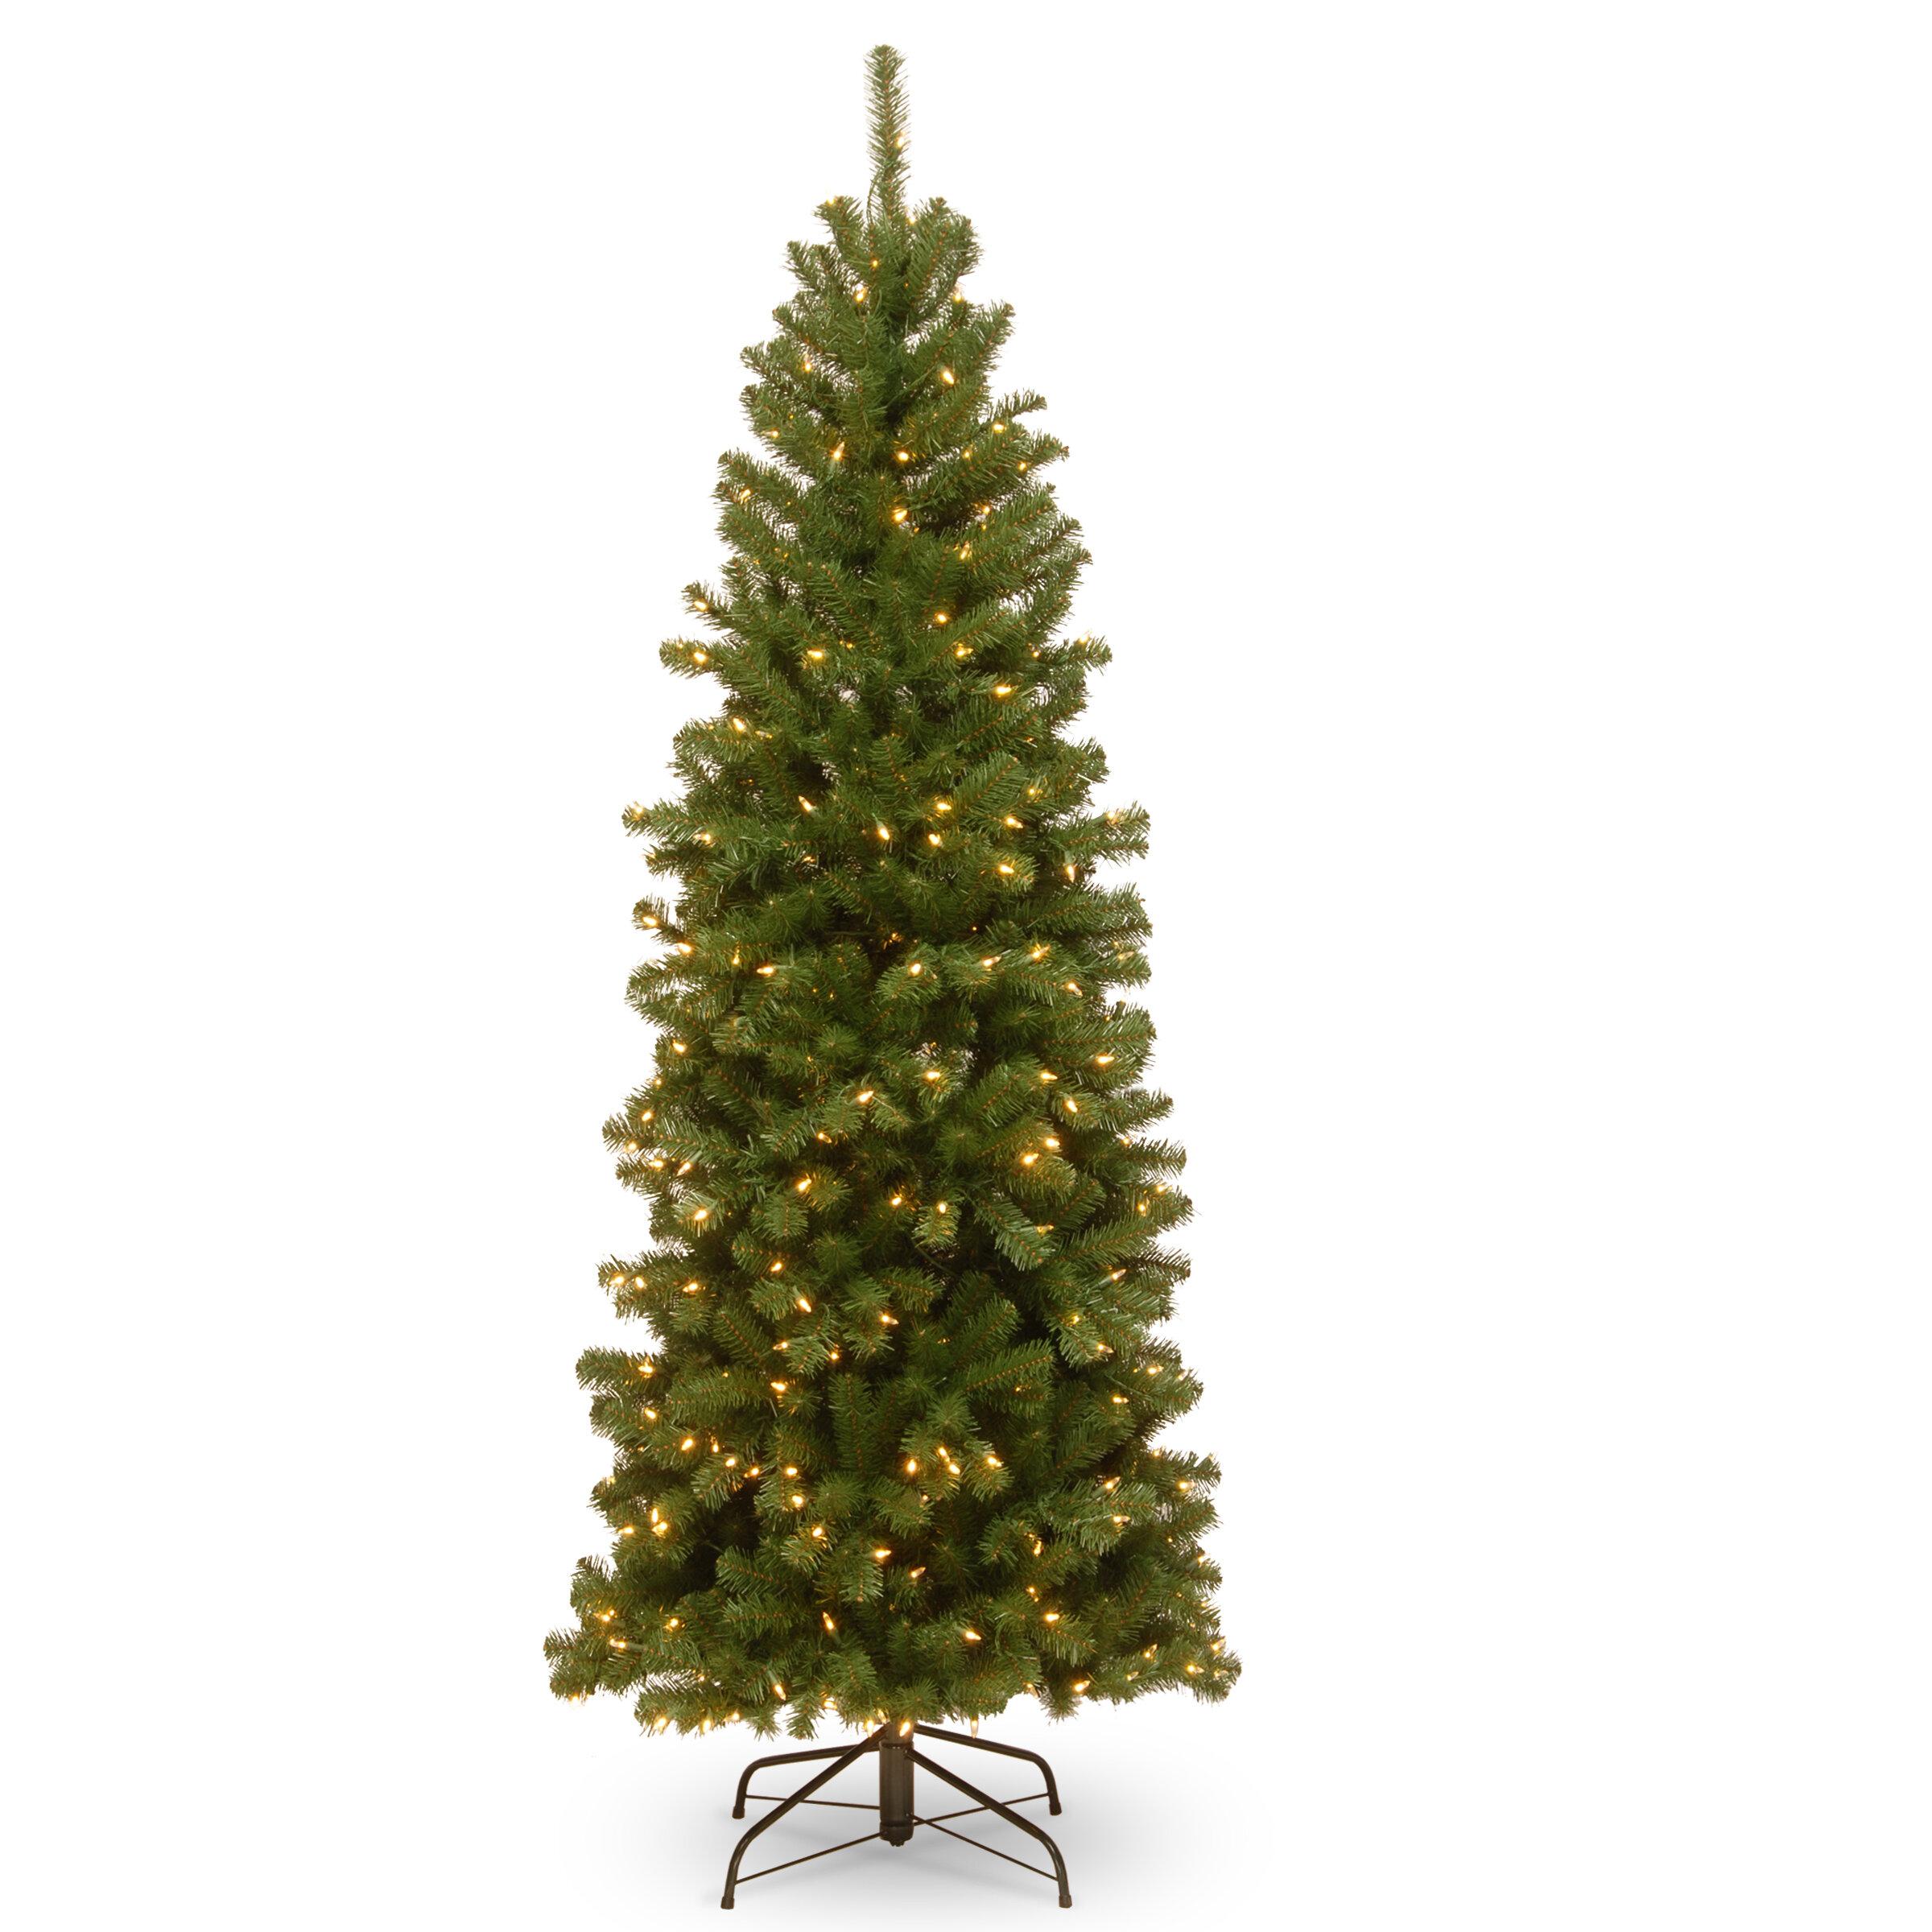 Christmas Branch Tree.9 Foot Pre Lit Christmas Trees You Ll Love In 2019 Wayfair